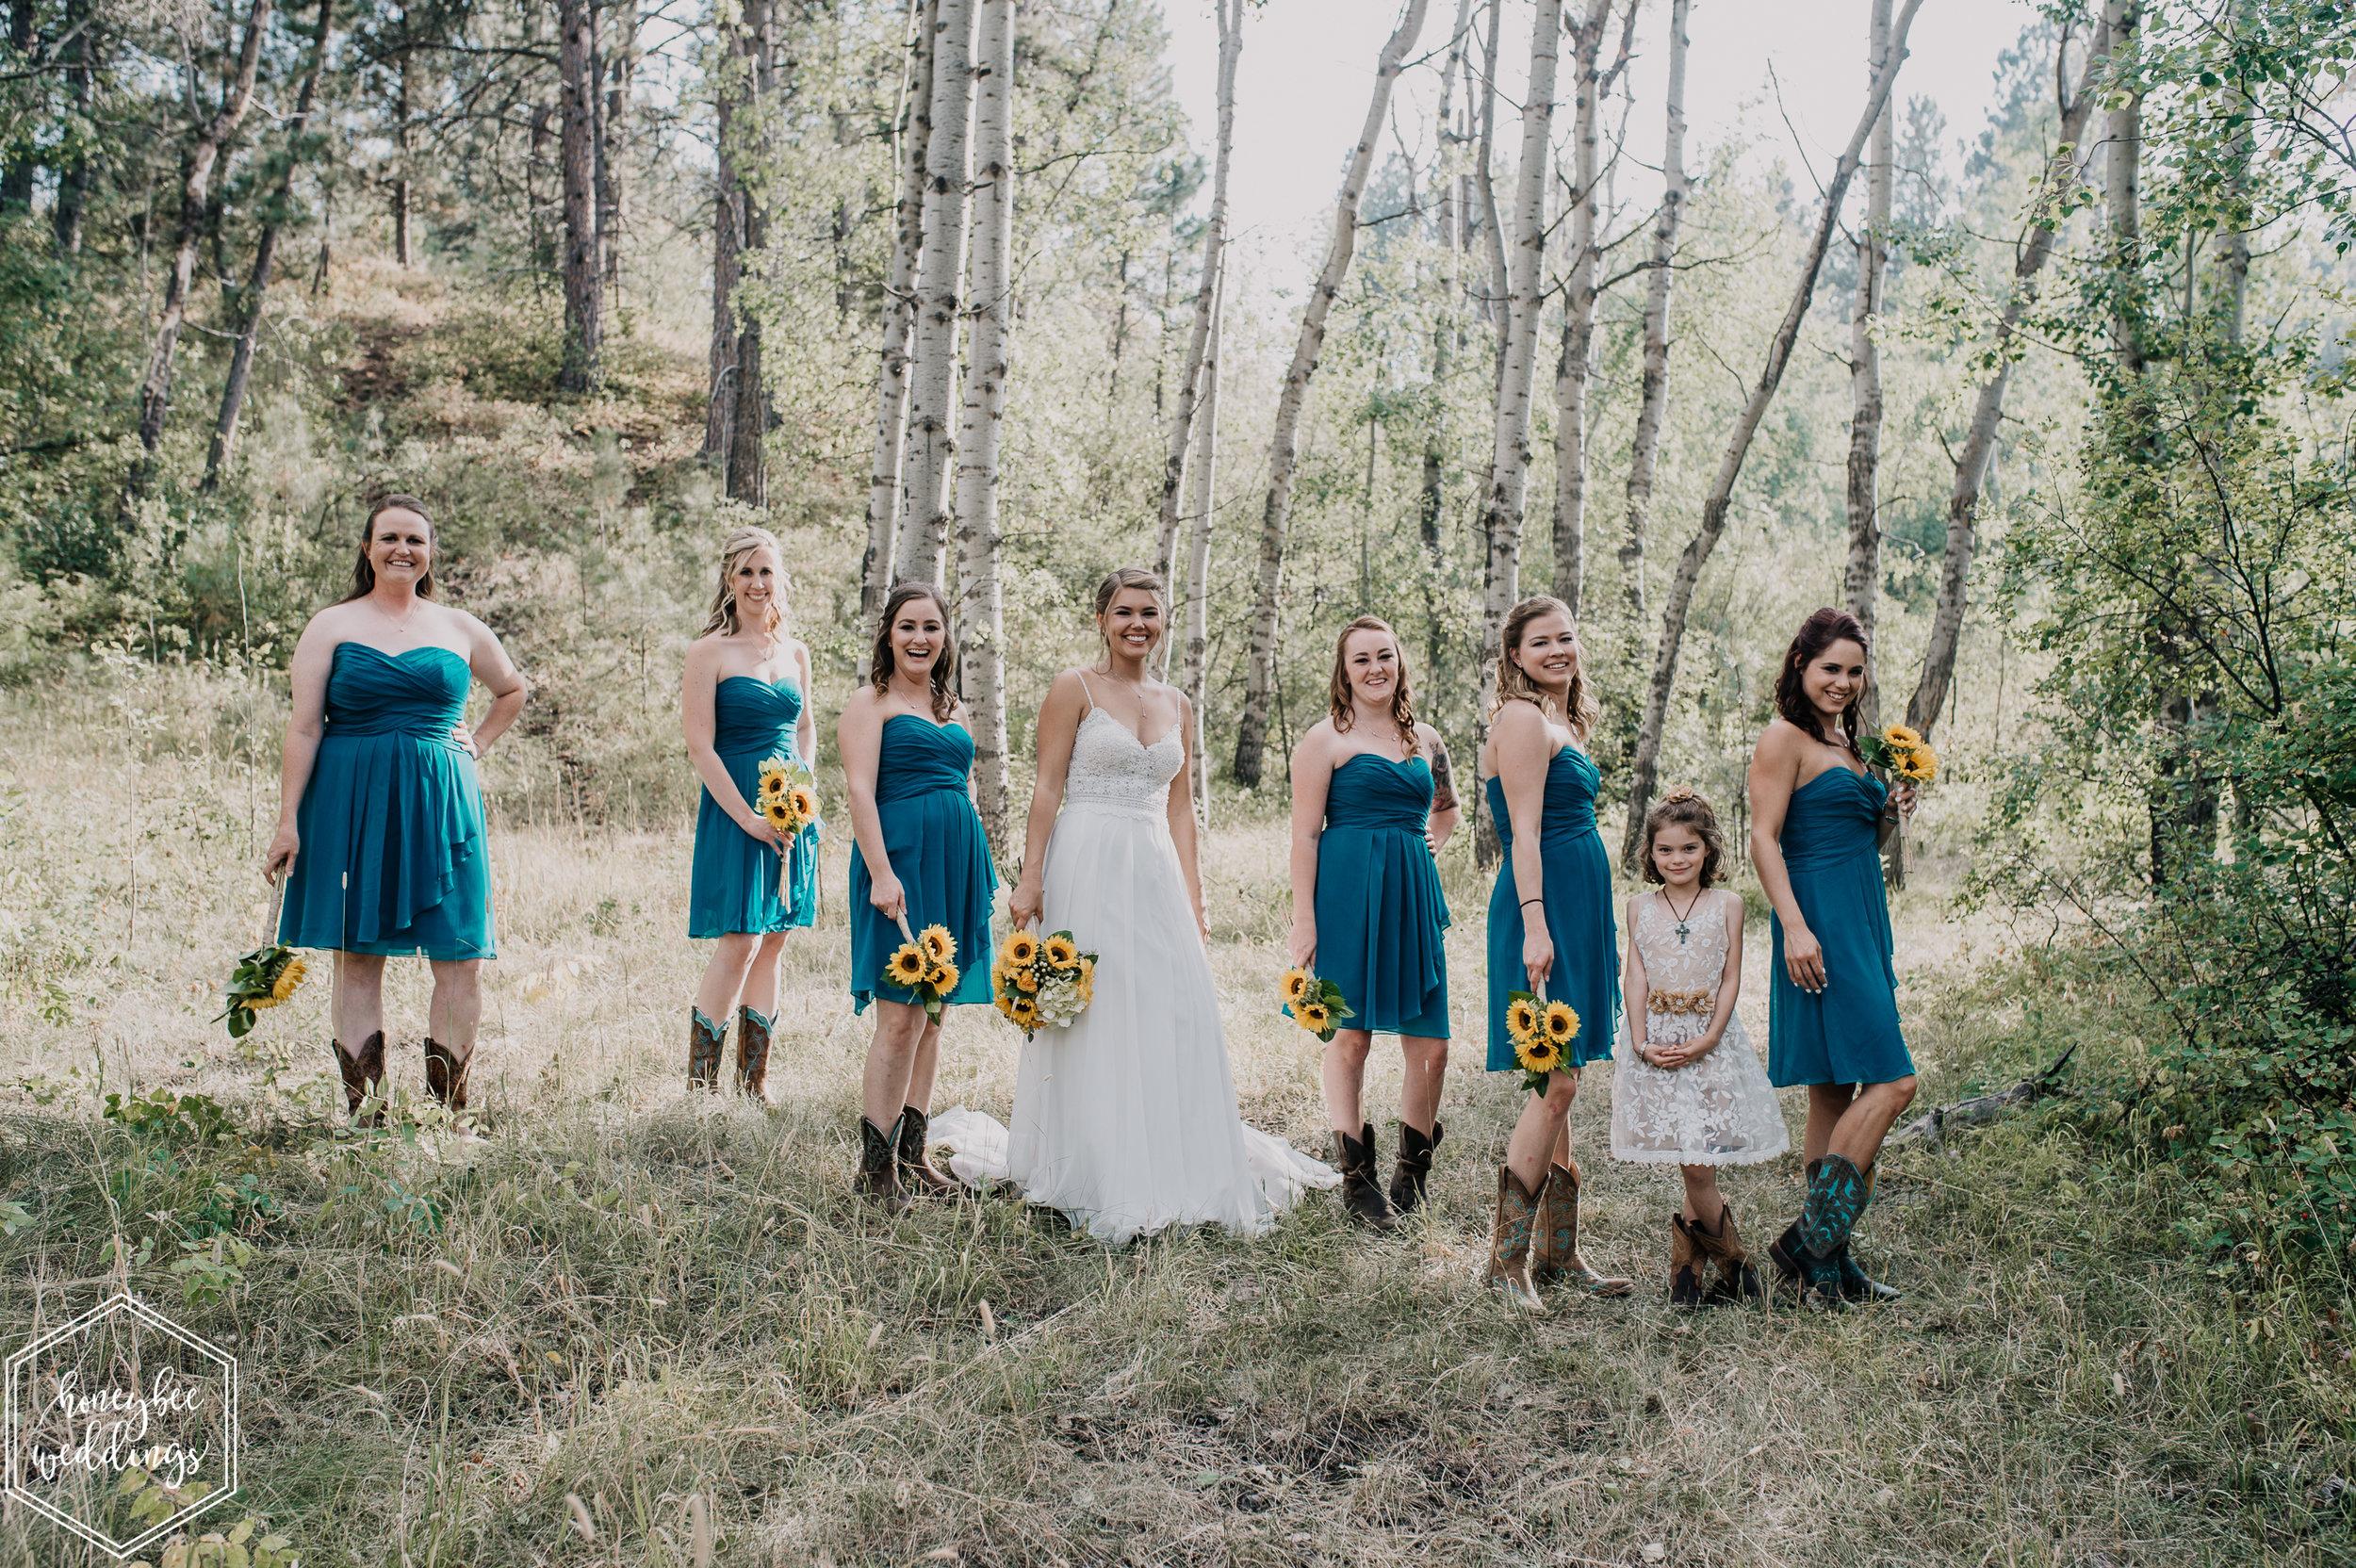 0156Havre Wedding_Ranch Wedding_Montana Wedding Photographer_Katlyn Kenyon + Jade Nystrom_August 25, 2018-473.jpg